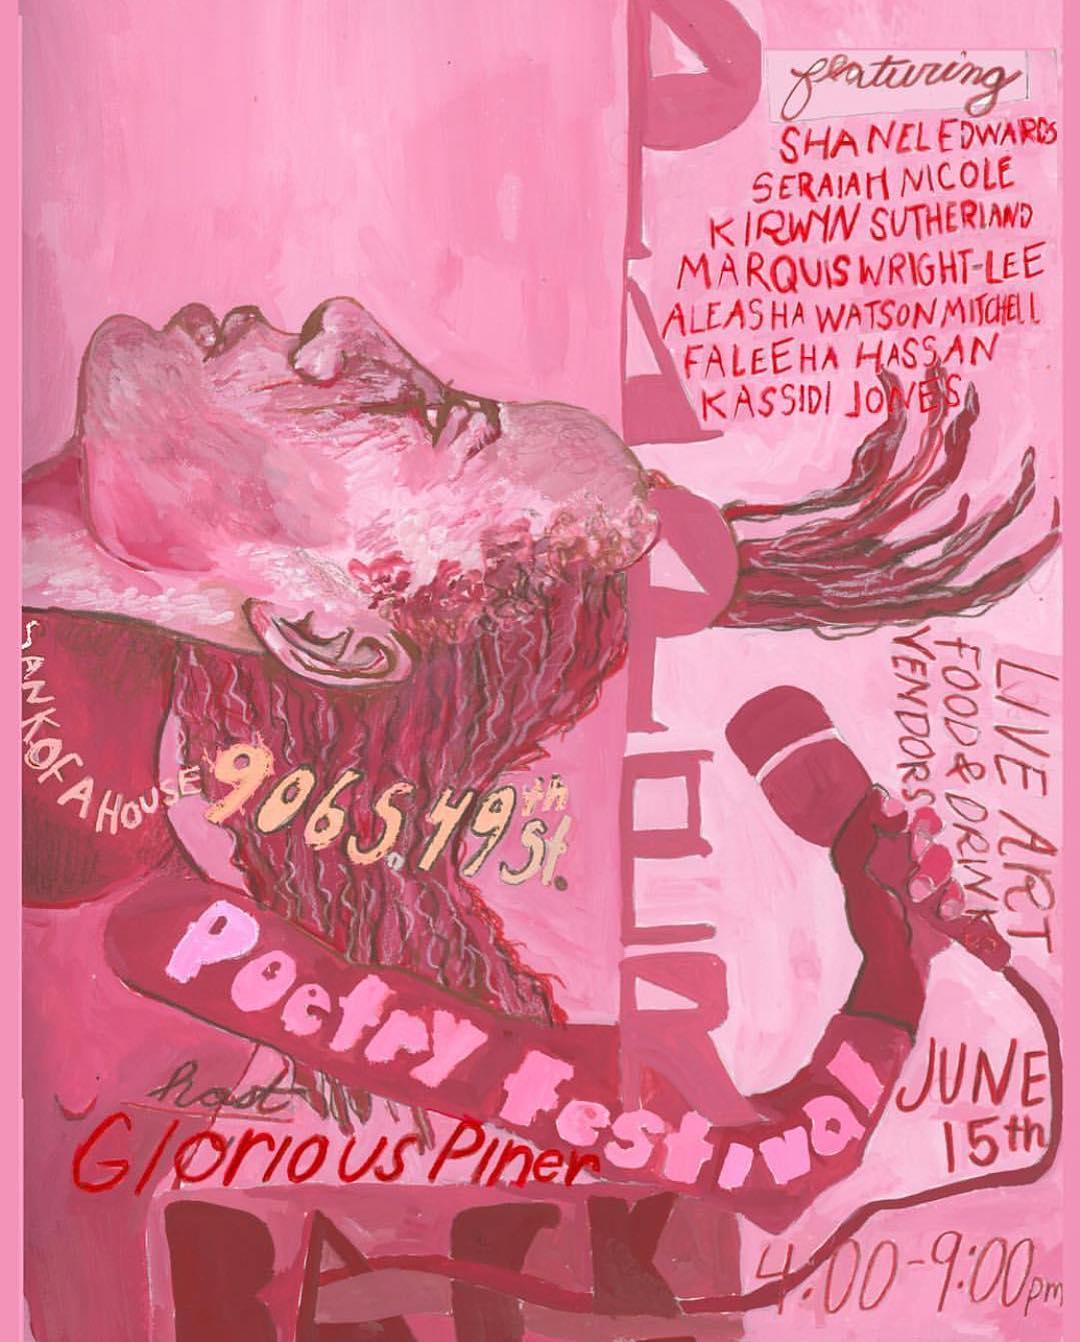 Paperback Poetry Festival: June 15th